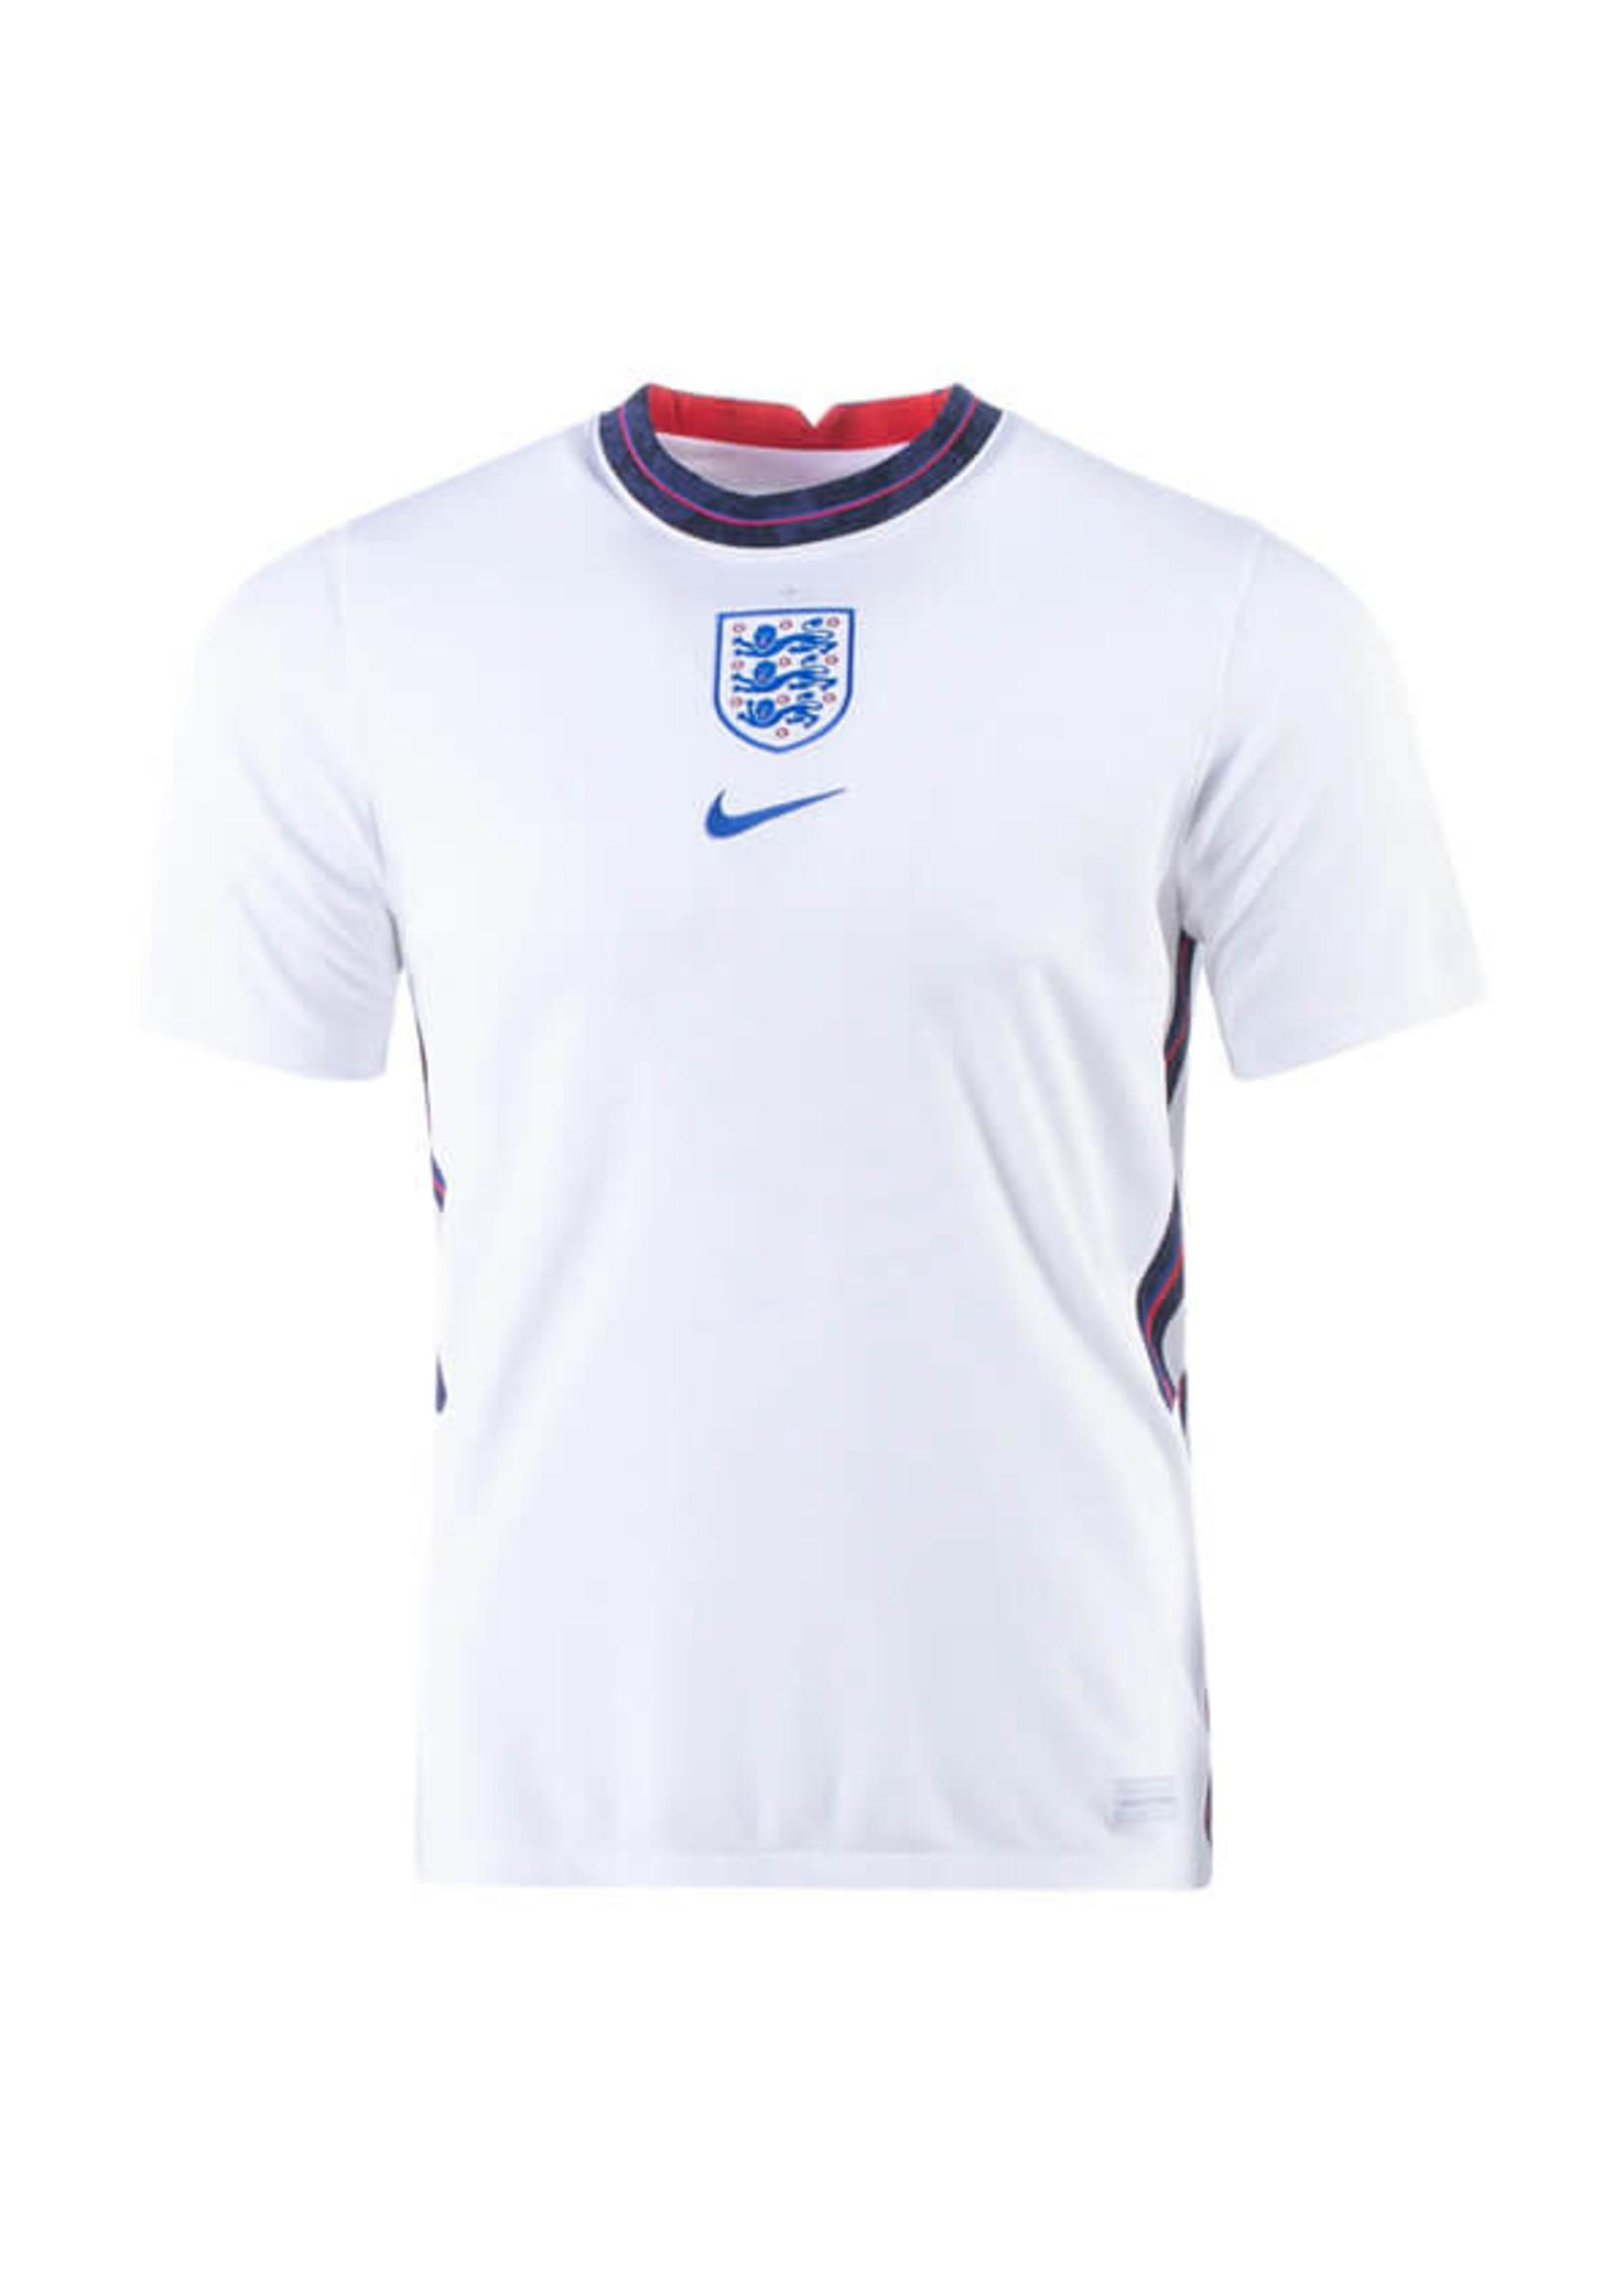 Nike ENGLAND EURO 2020 JERSEY HOME YOUTH